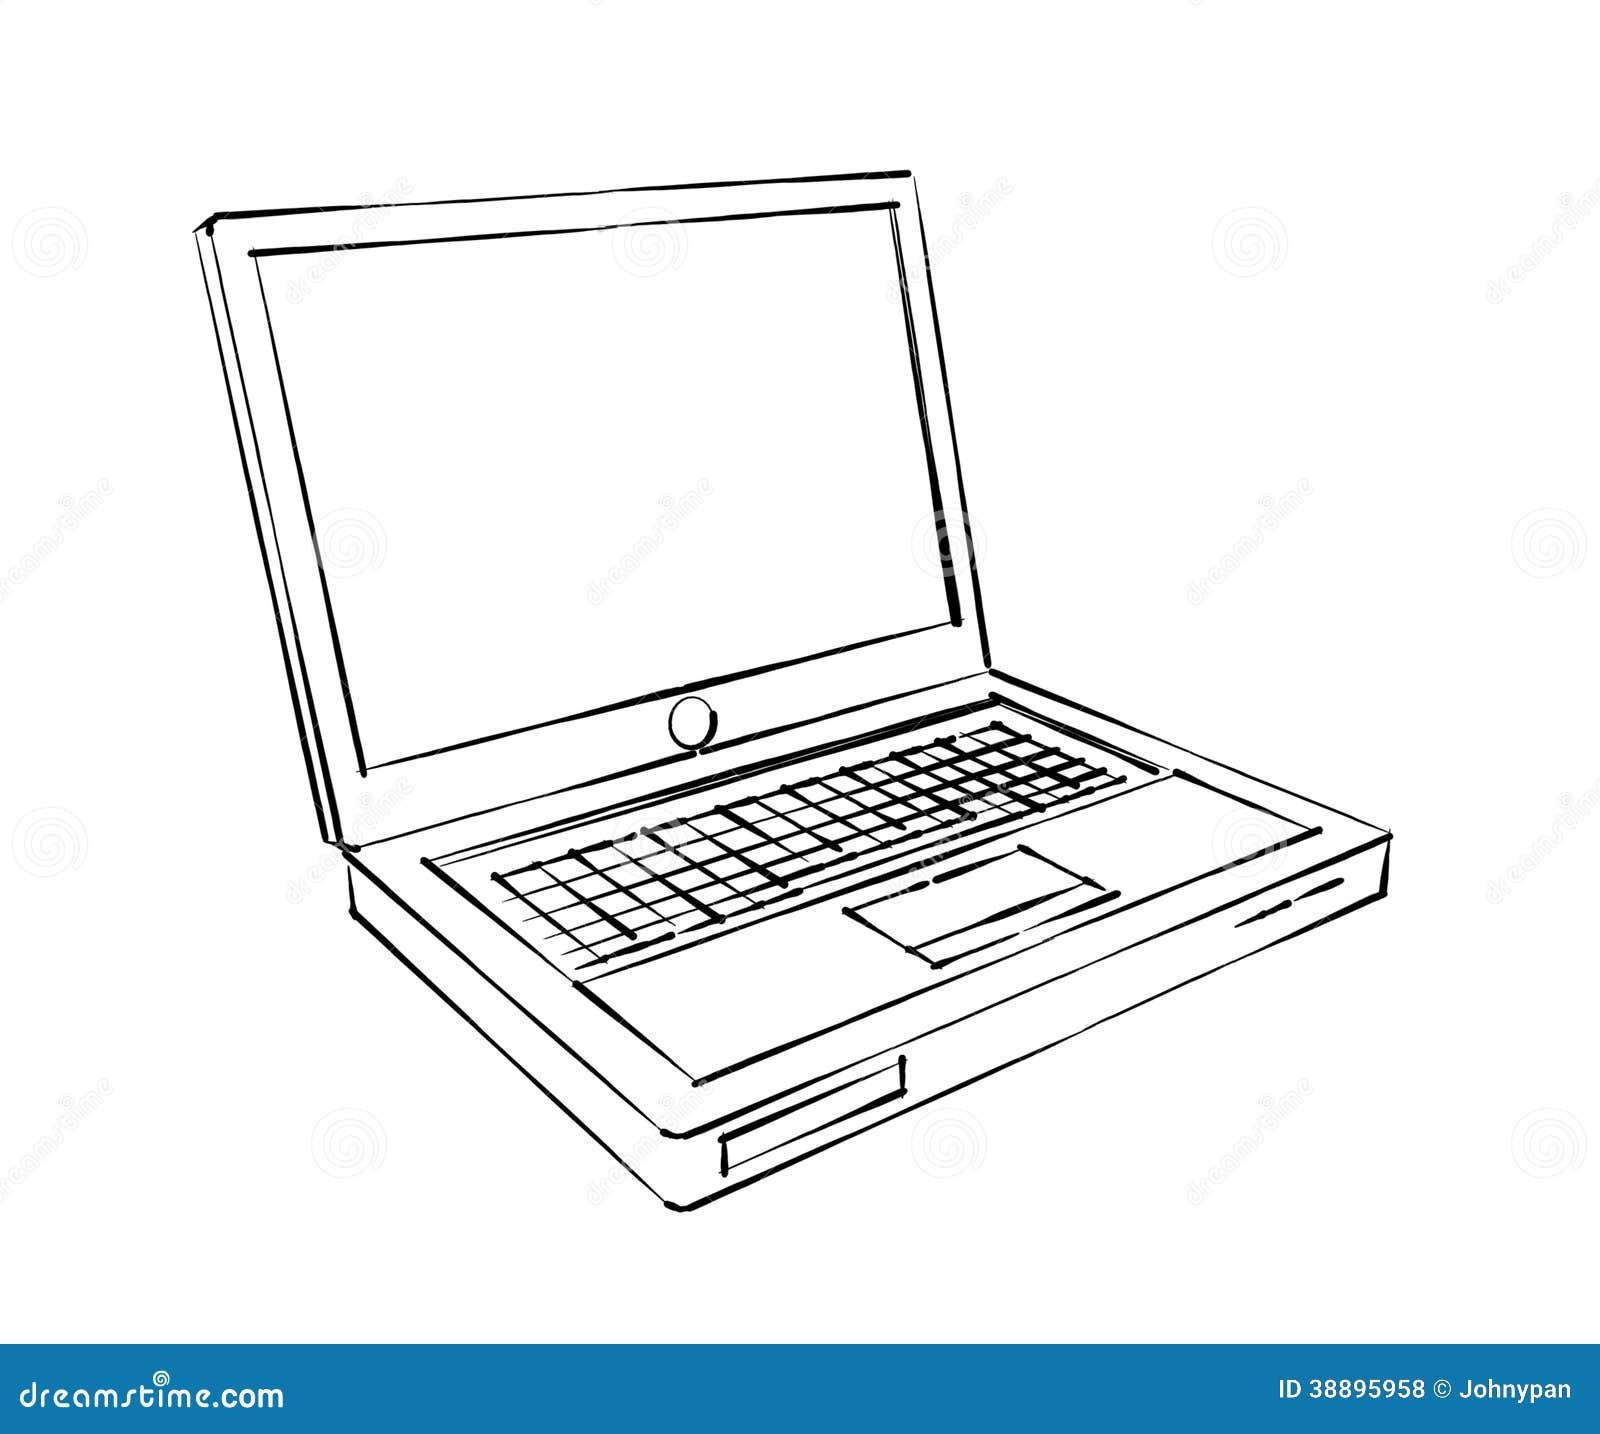 Laptop Computer Sketch Stock Illustration Image 38895958